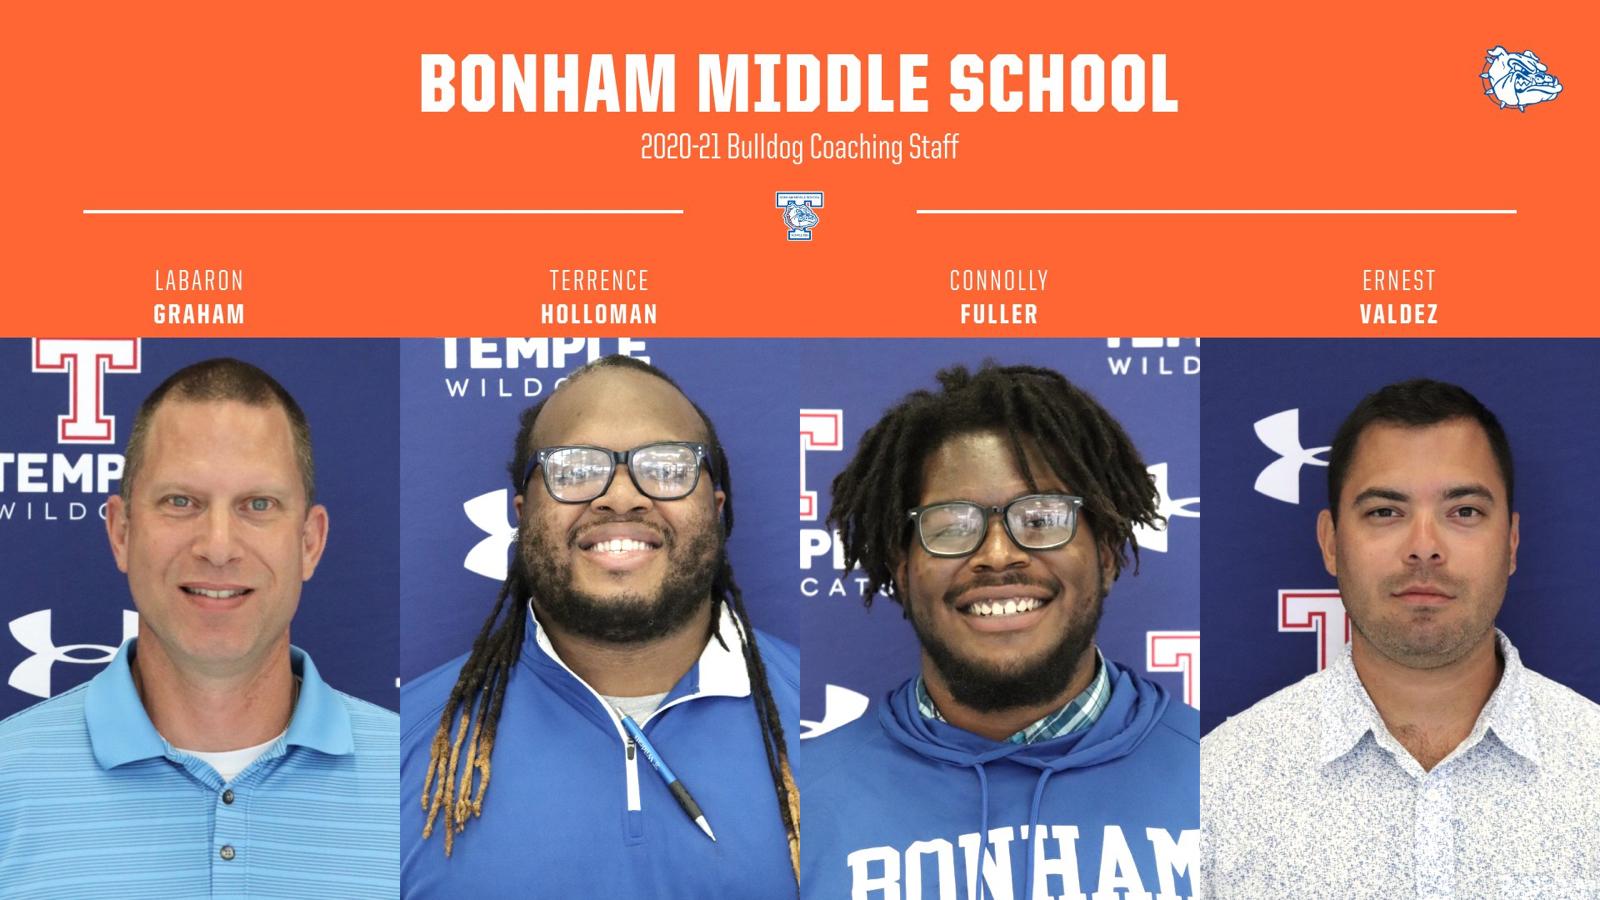 Bonham Middle School Boys Coaching Staff